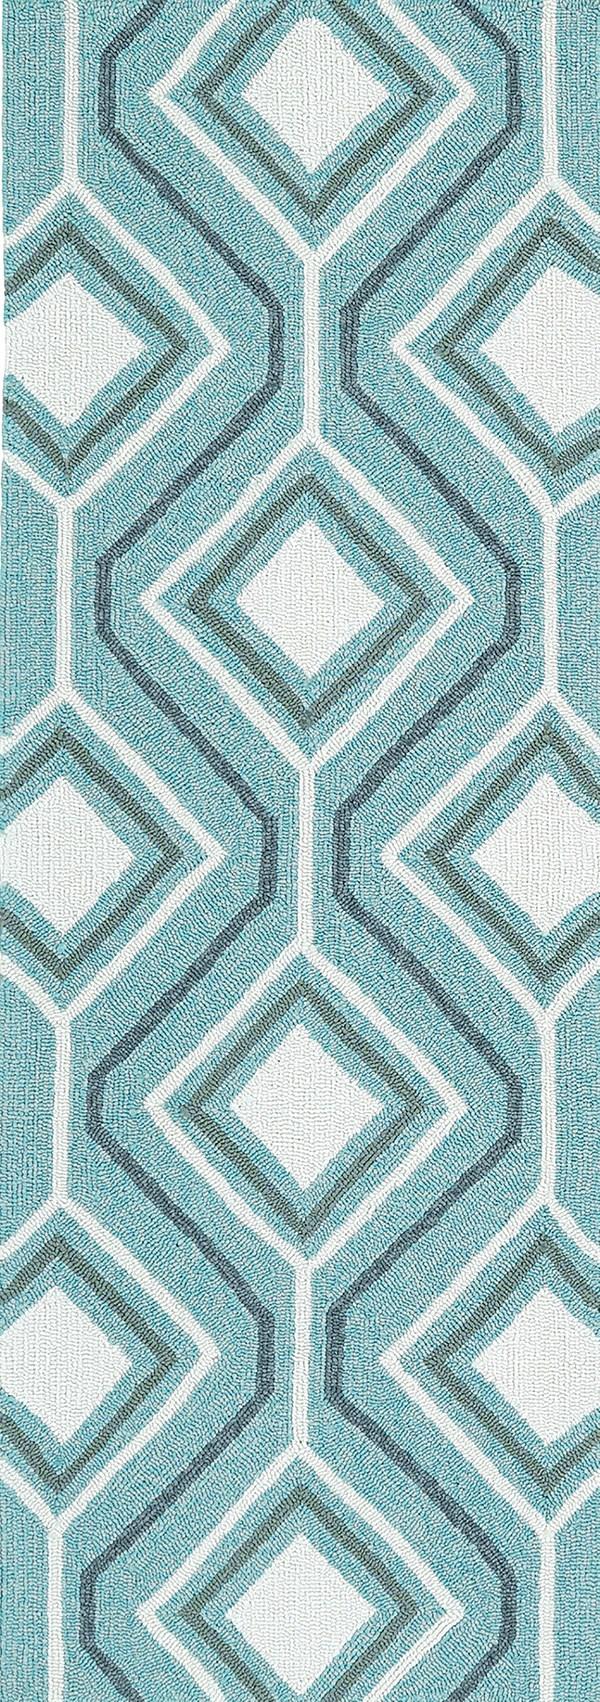 Blue, Grey, Ivory (17) Moroccan Area Rug